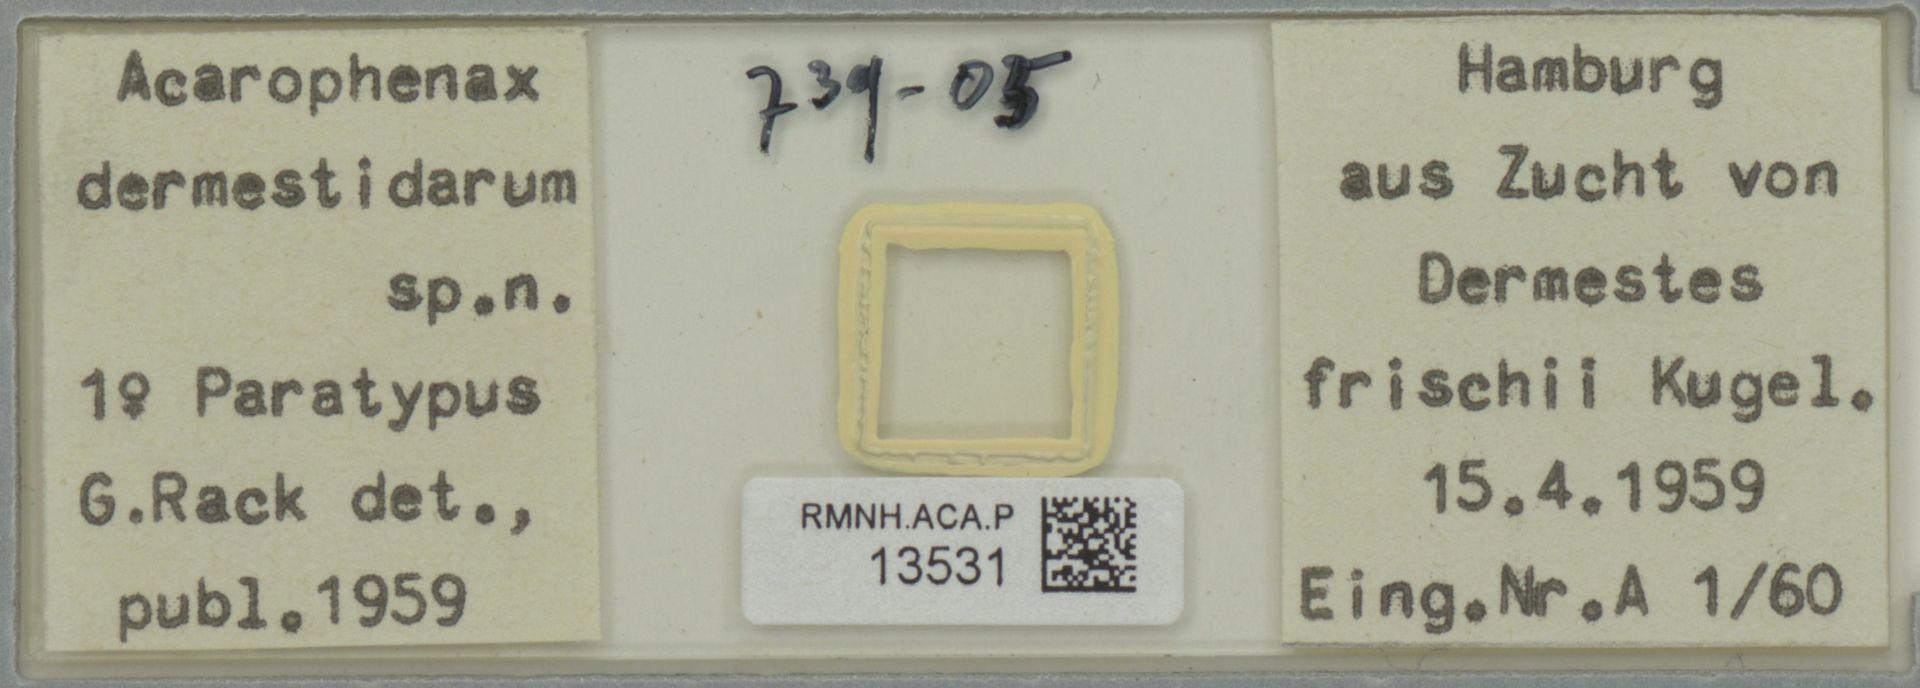 RMNH.ACA.P.13531   Acarophenax dermestidarum